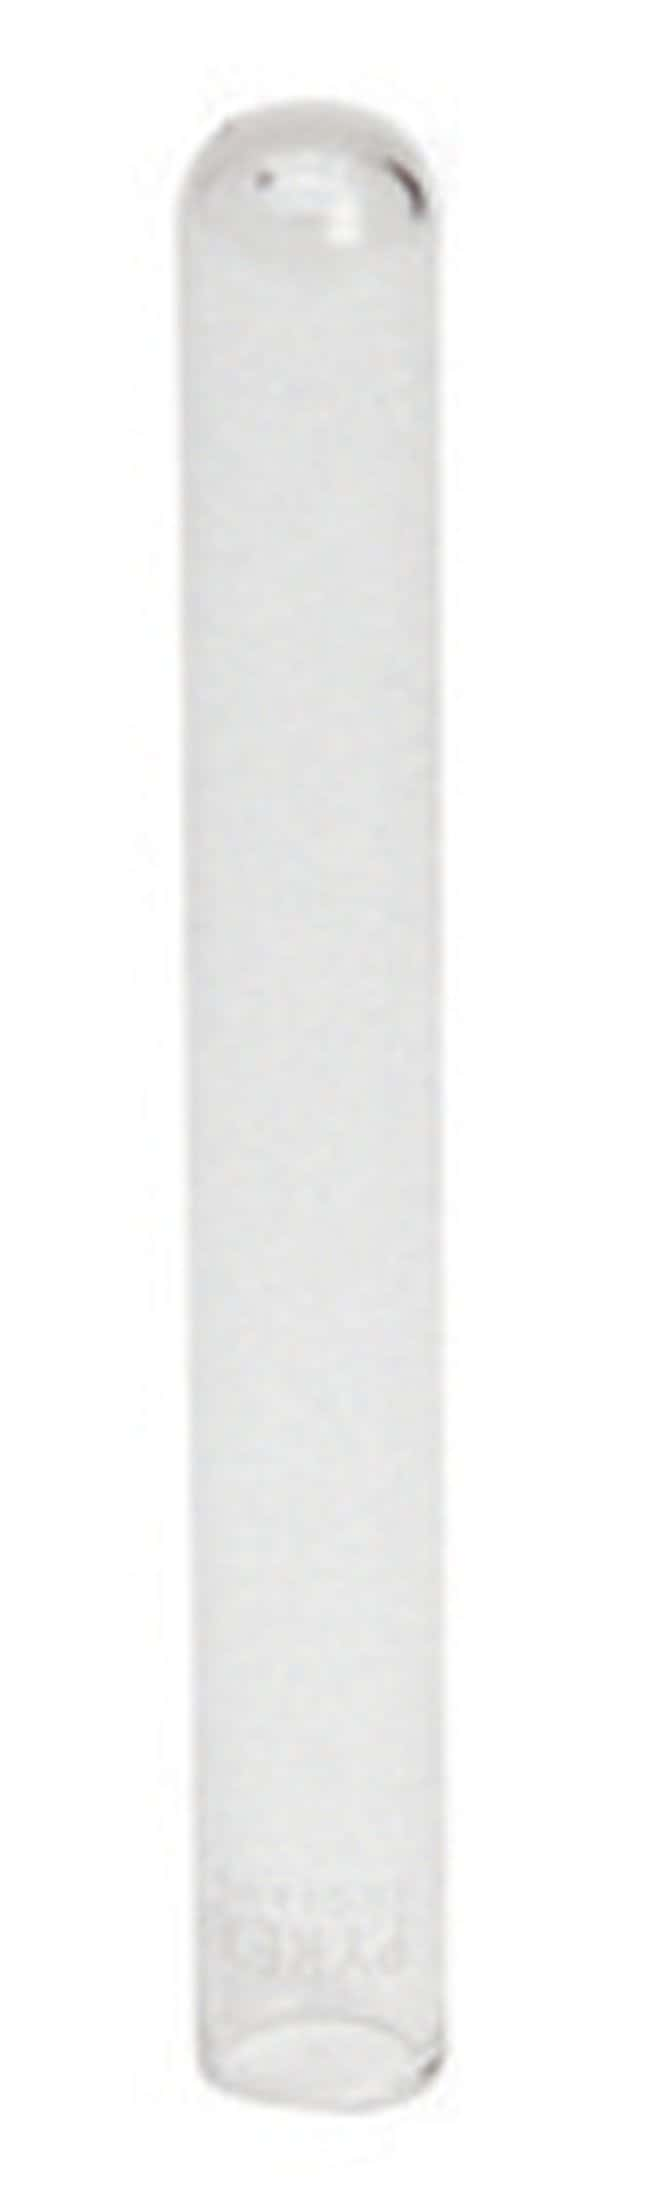 HeidolphGlassware - Test Tubes With rim; Diameter: 16mm (0.62 in.); Length: